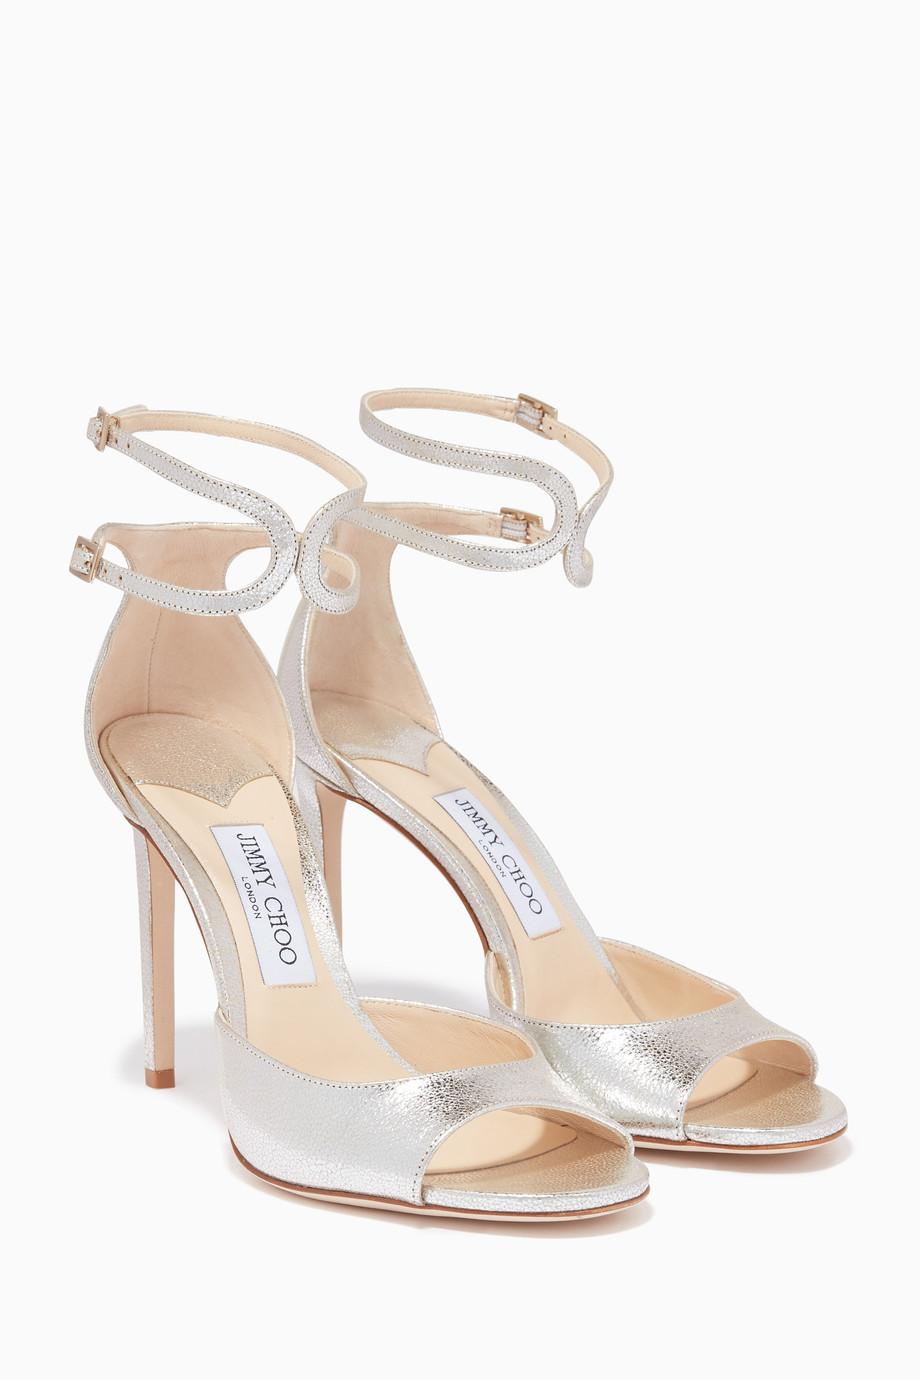 51cb107664e4 Shop Jimmy Choo Neutral Champagne Metallic Lane 100 Sandals for ...